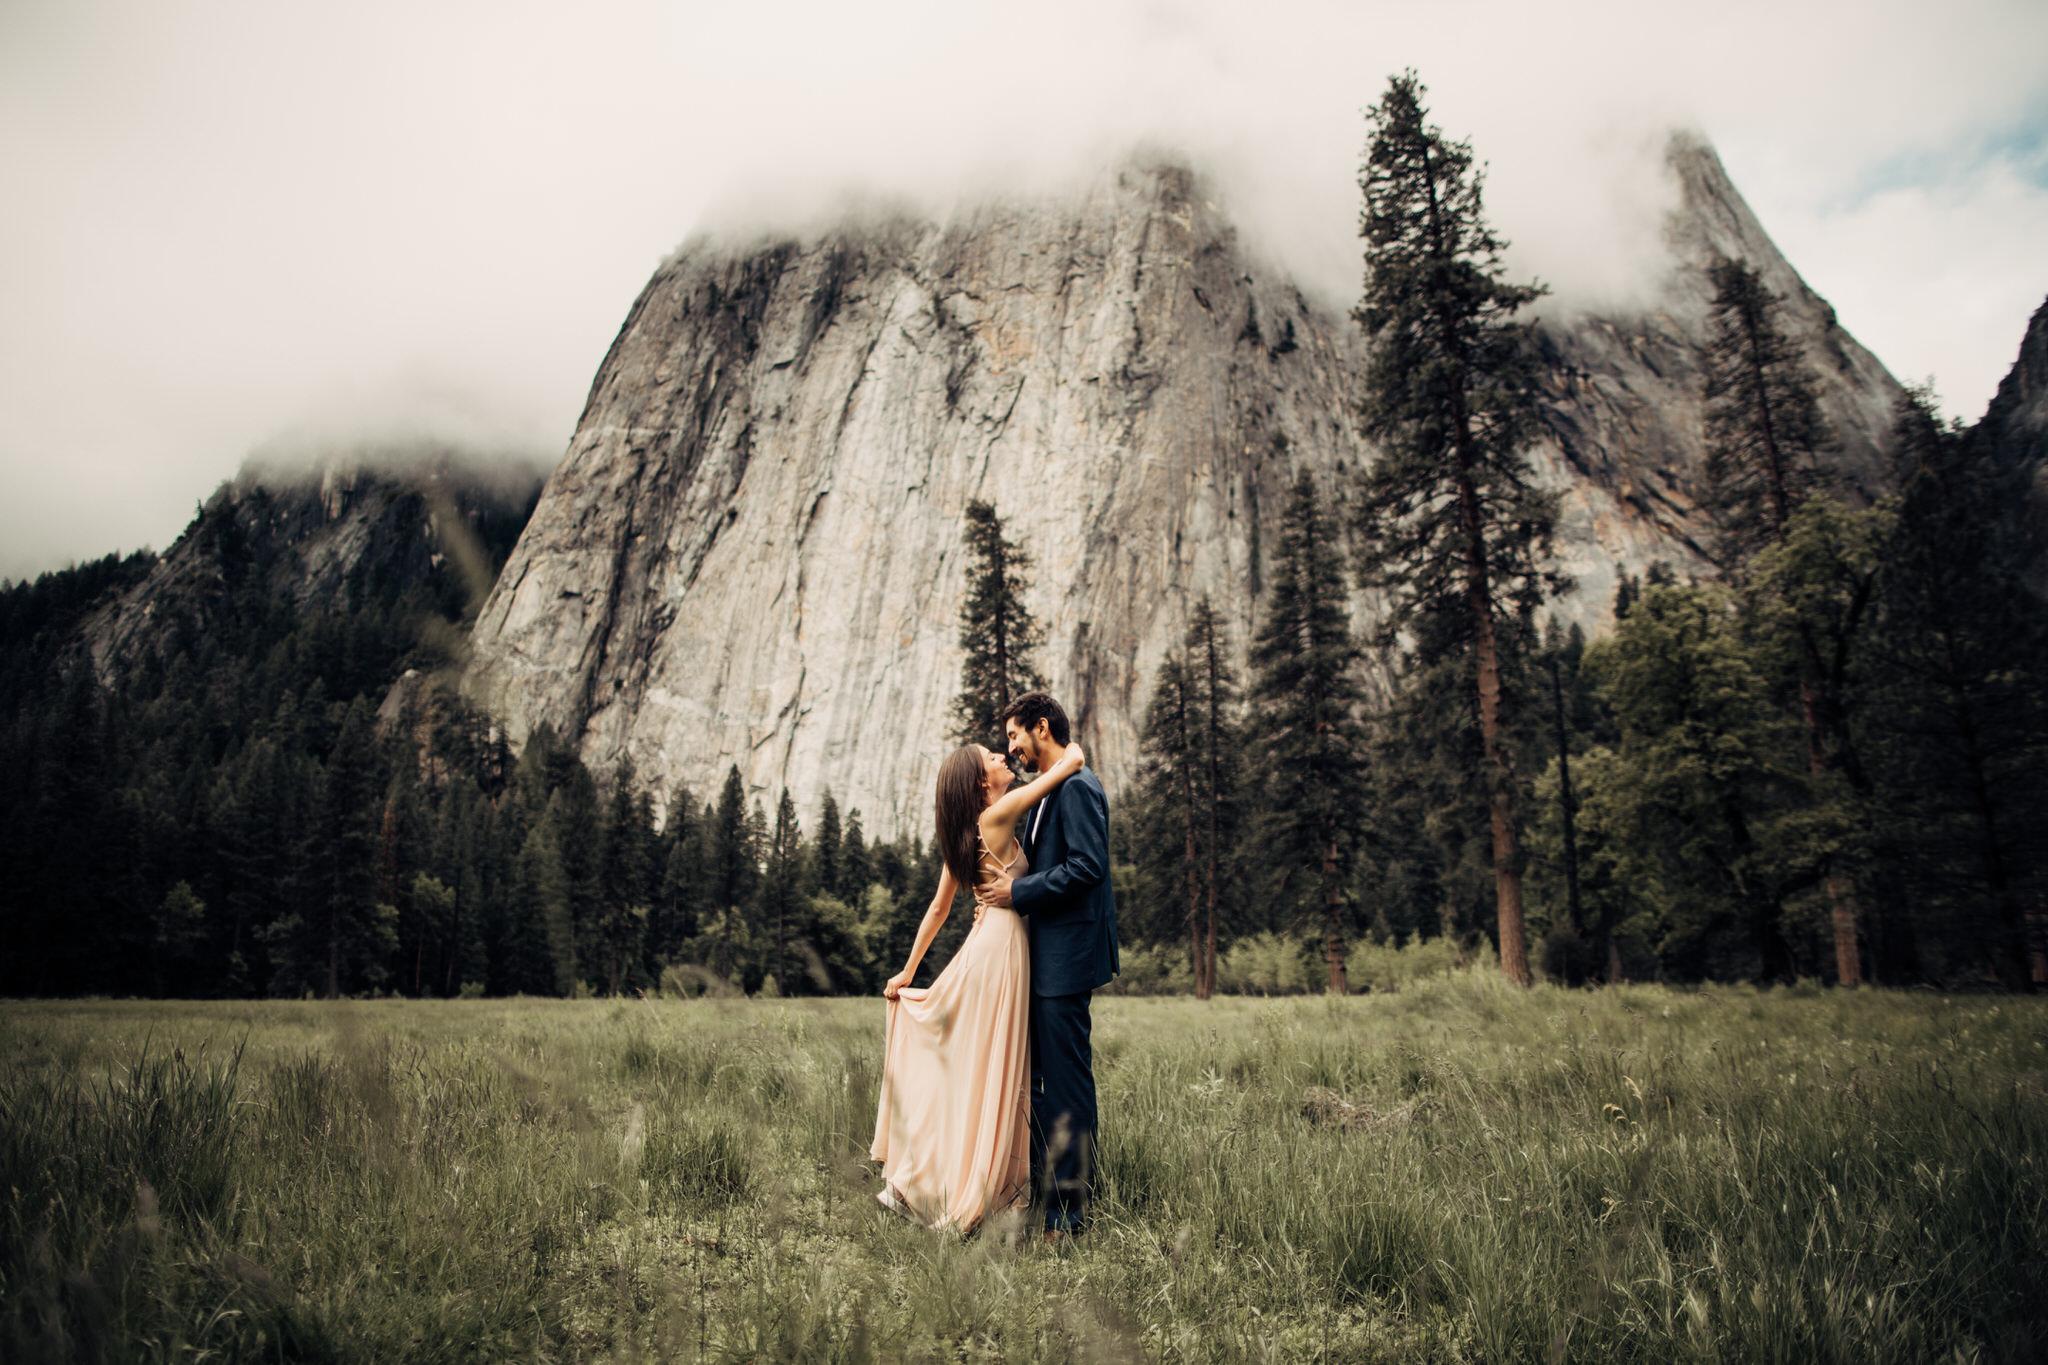 Yosemite-engagement-session-lauren-and-tom62.jpg